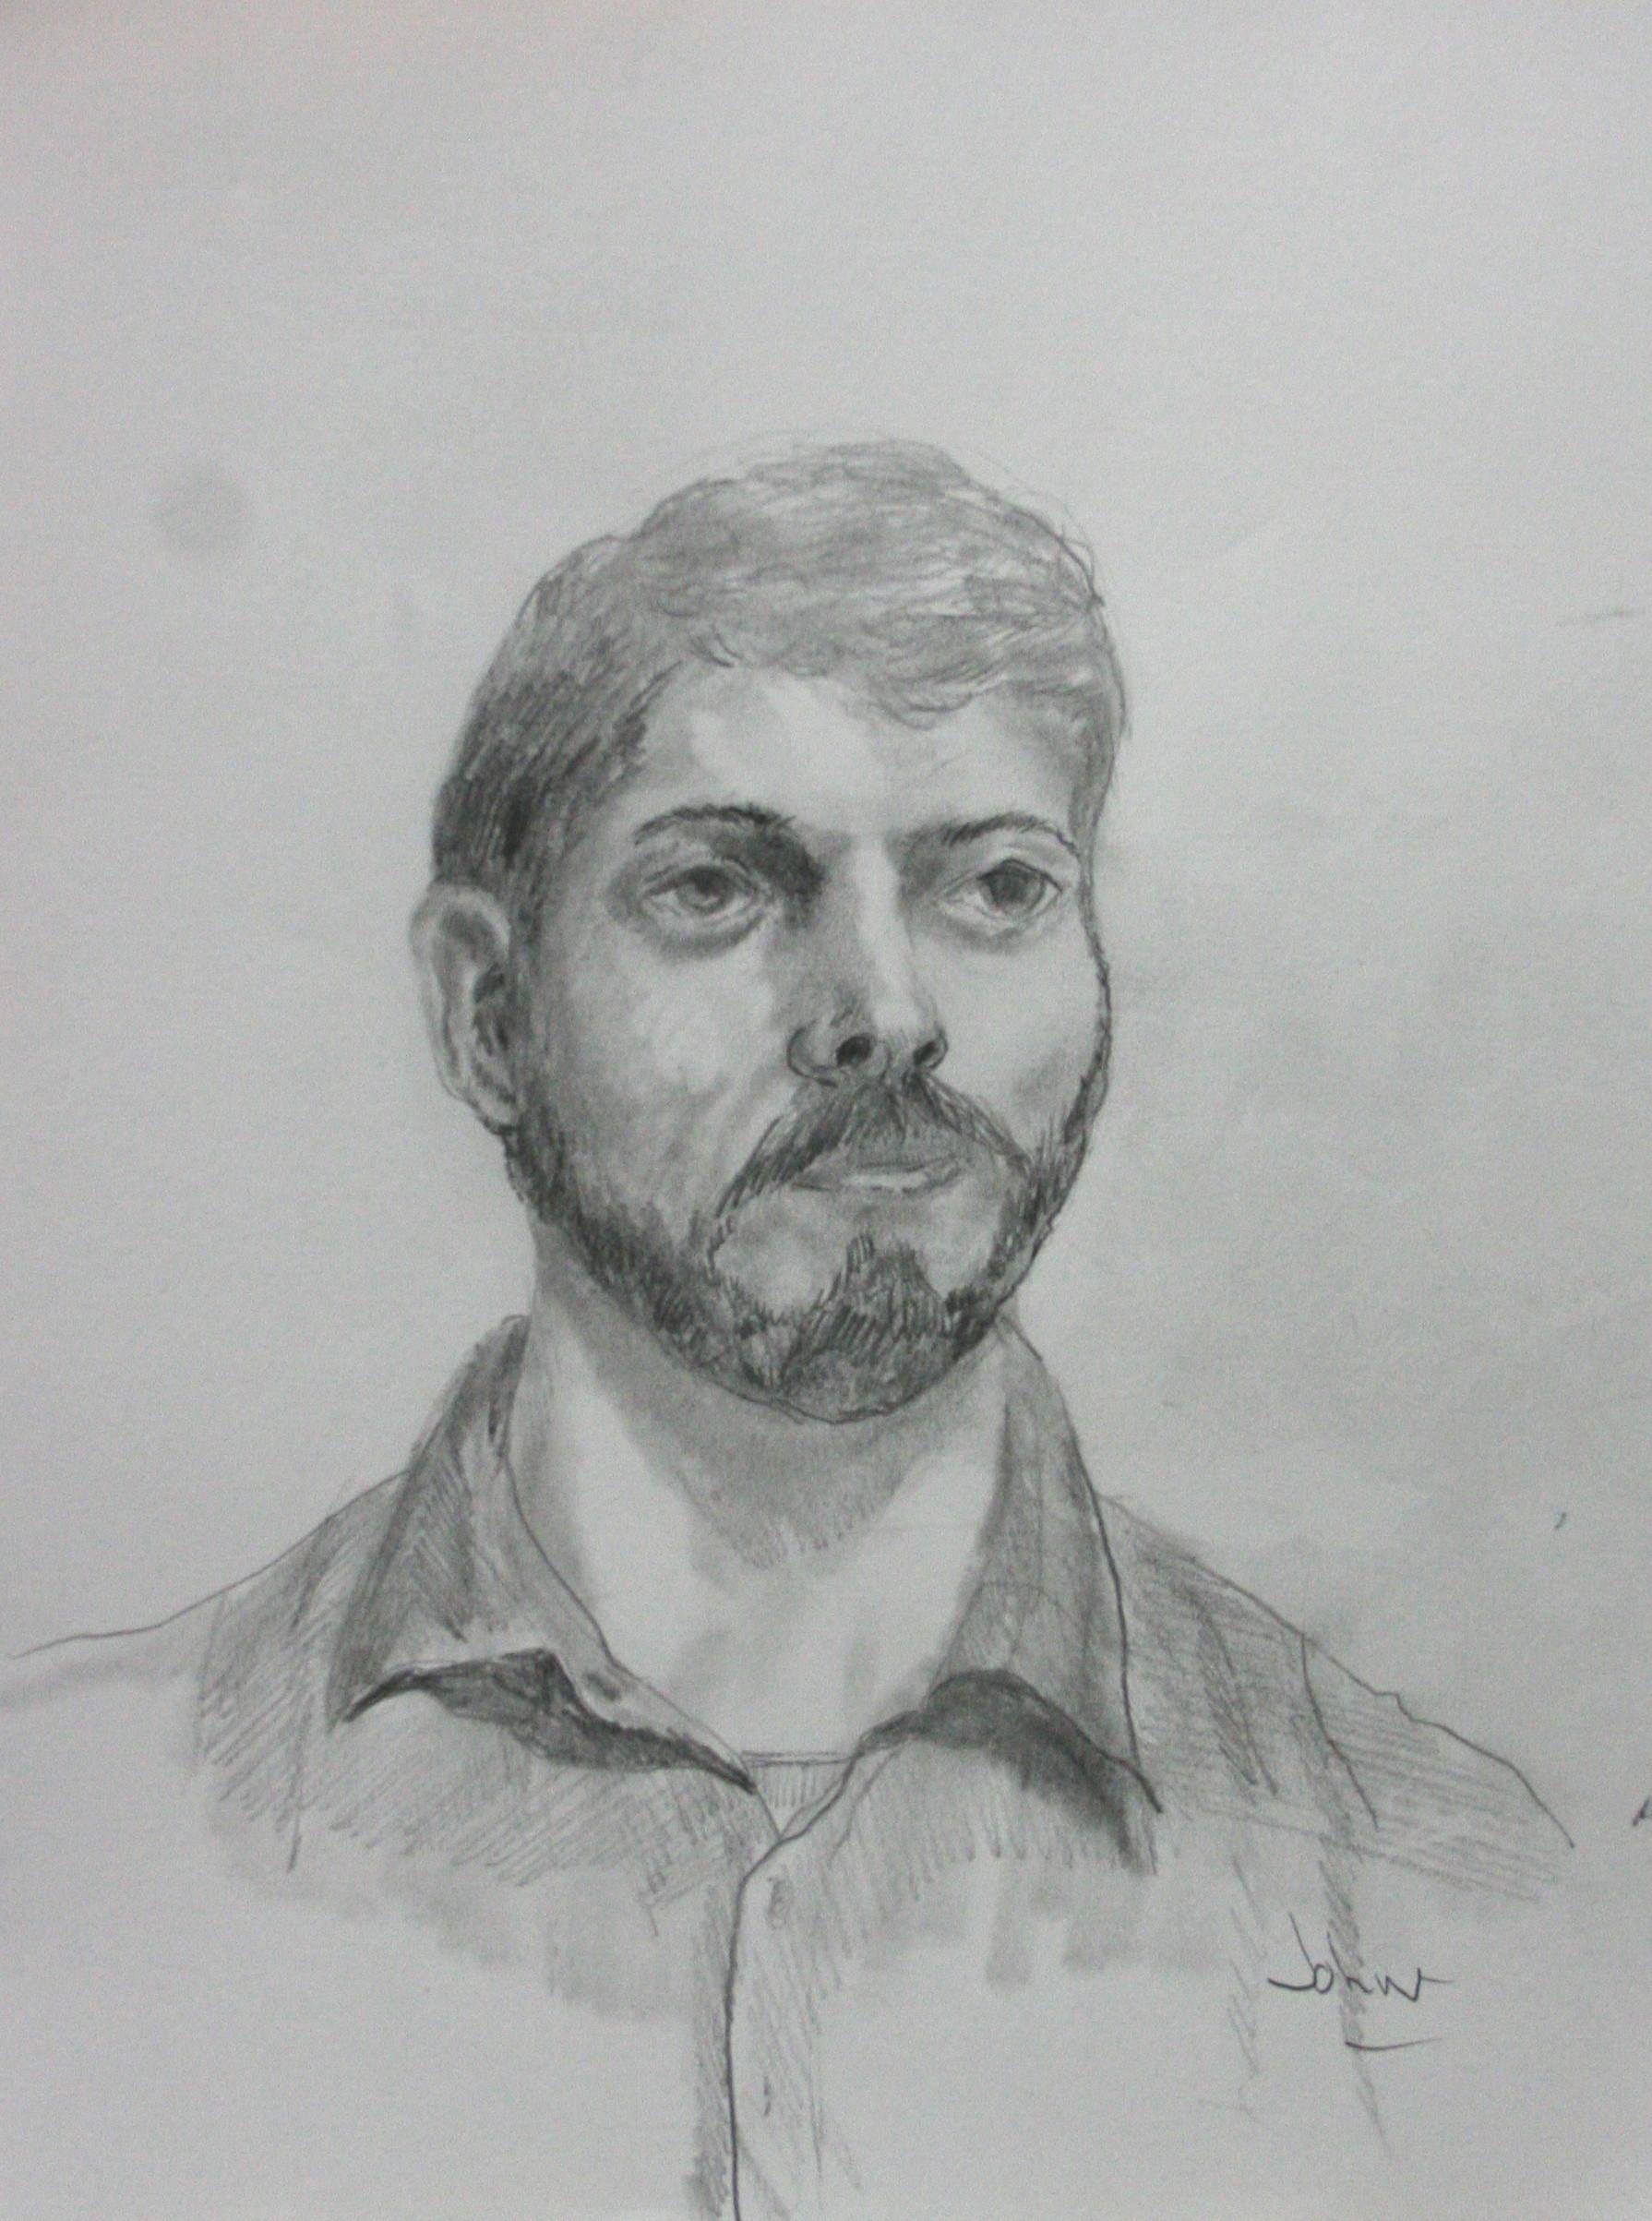 John R. Davis did this 2-hour drawing.